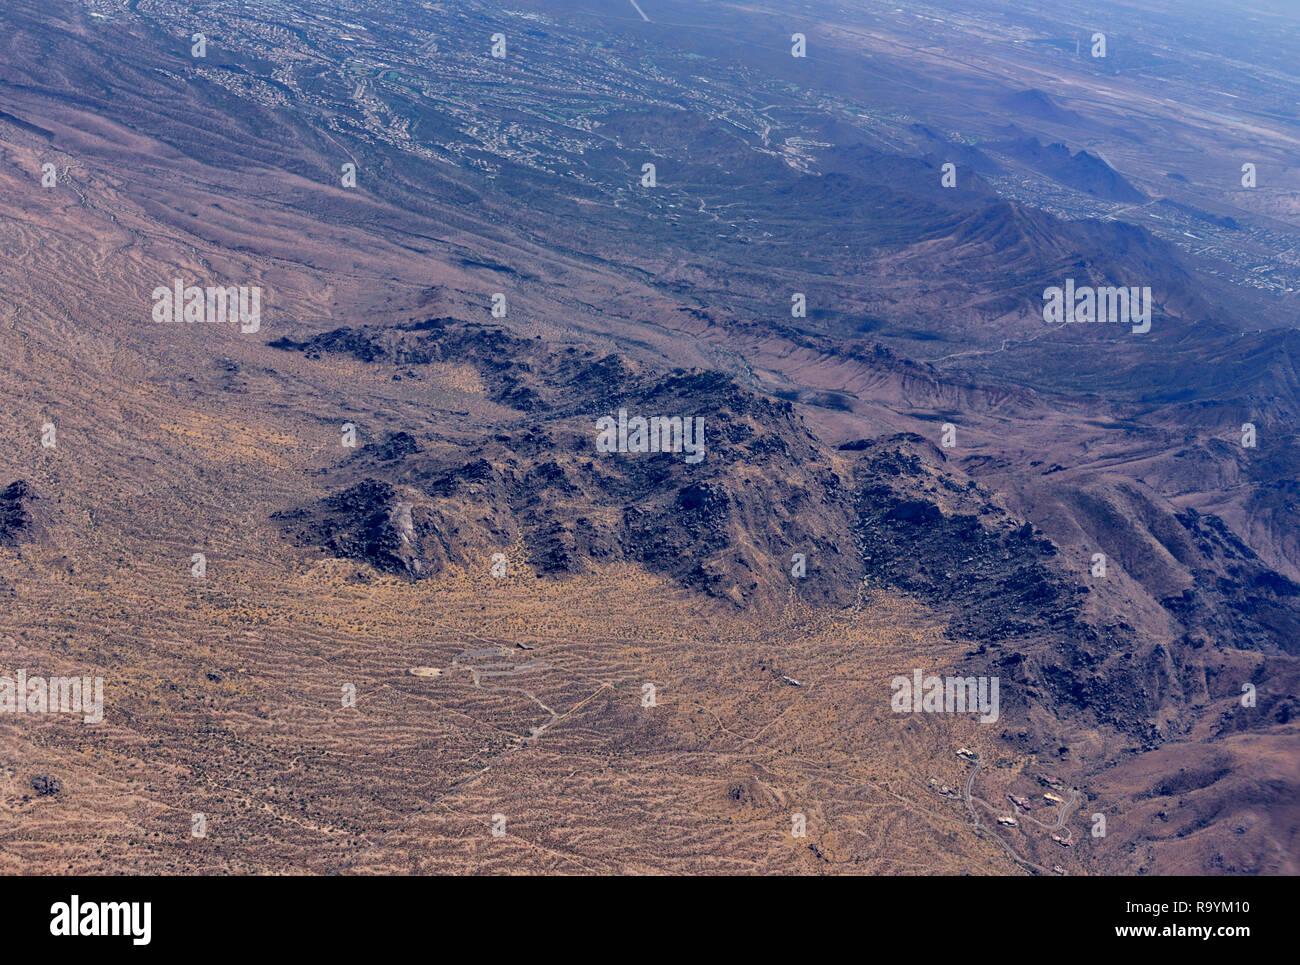 Aerial view mountains and desert outside Phoenix AZ, USA - Stock Image